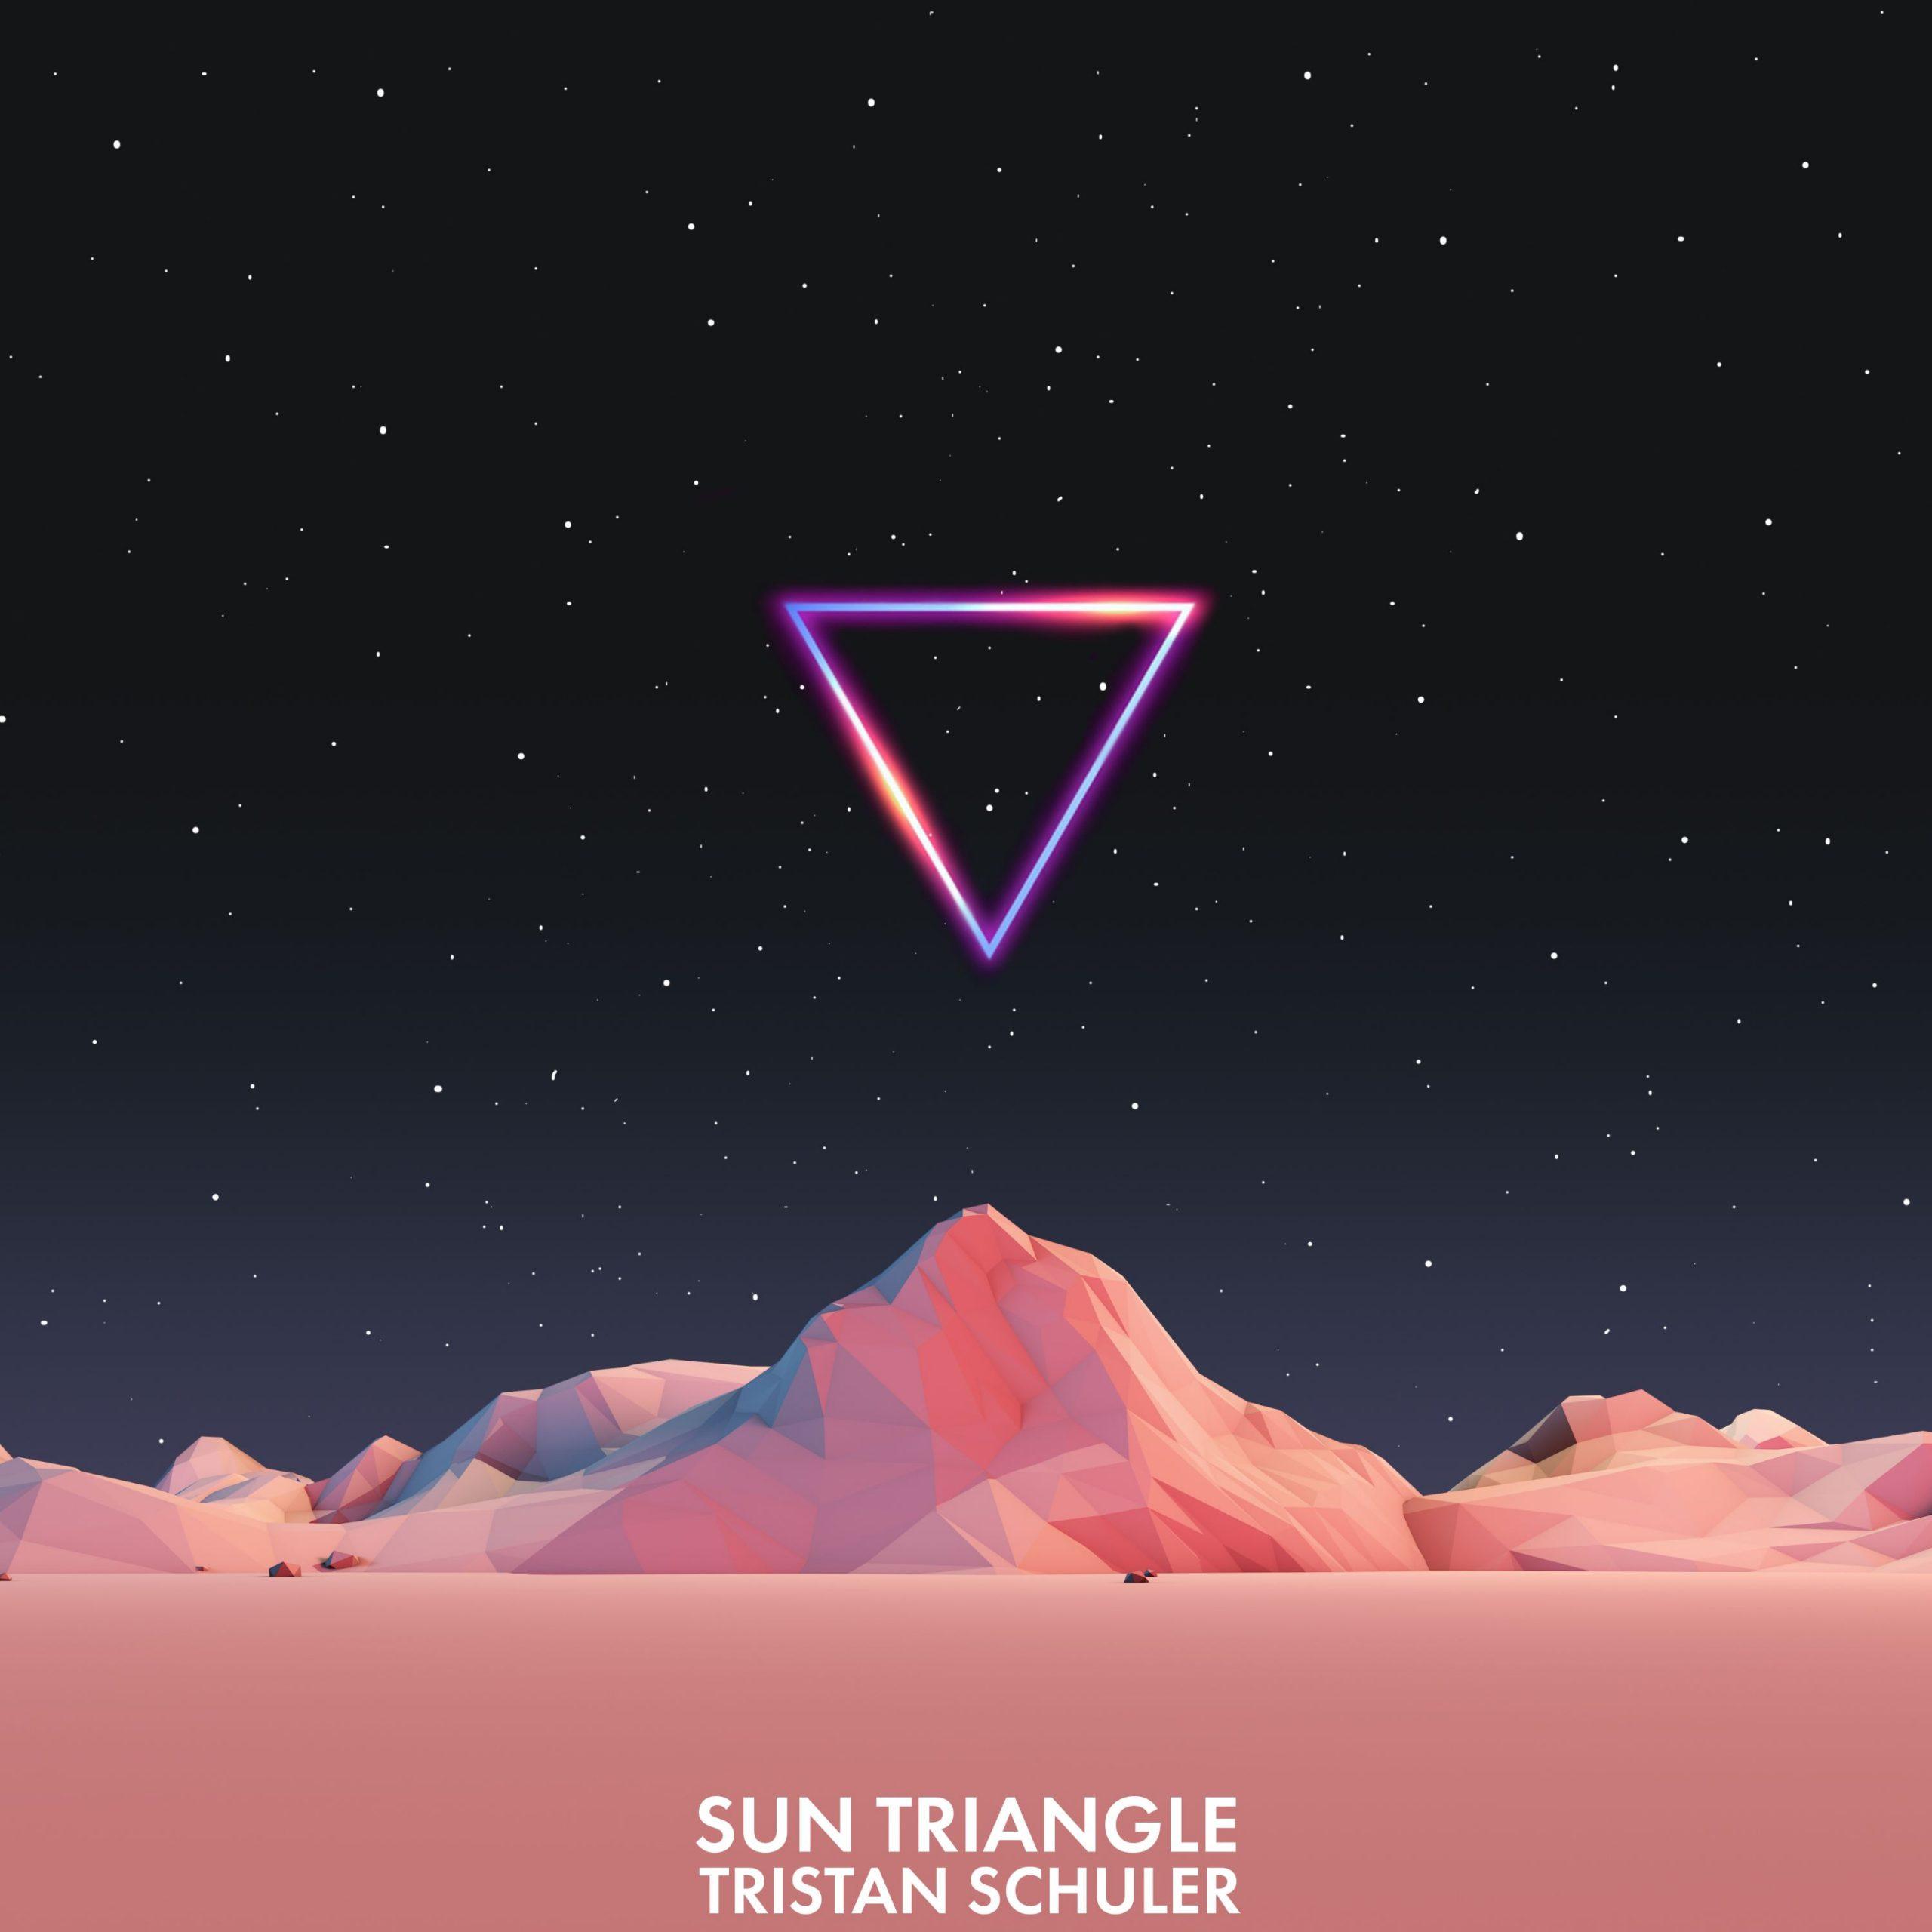 Sun Triangle - Tristan Schuler Album Cover